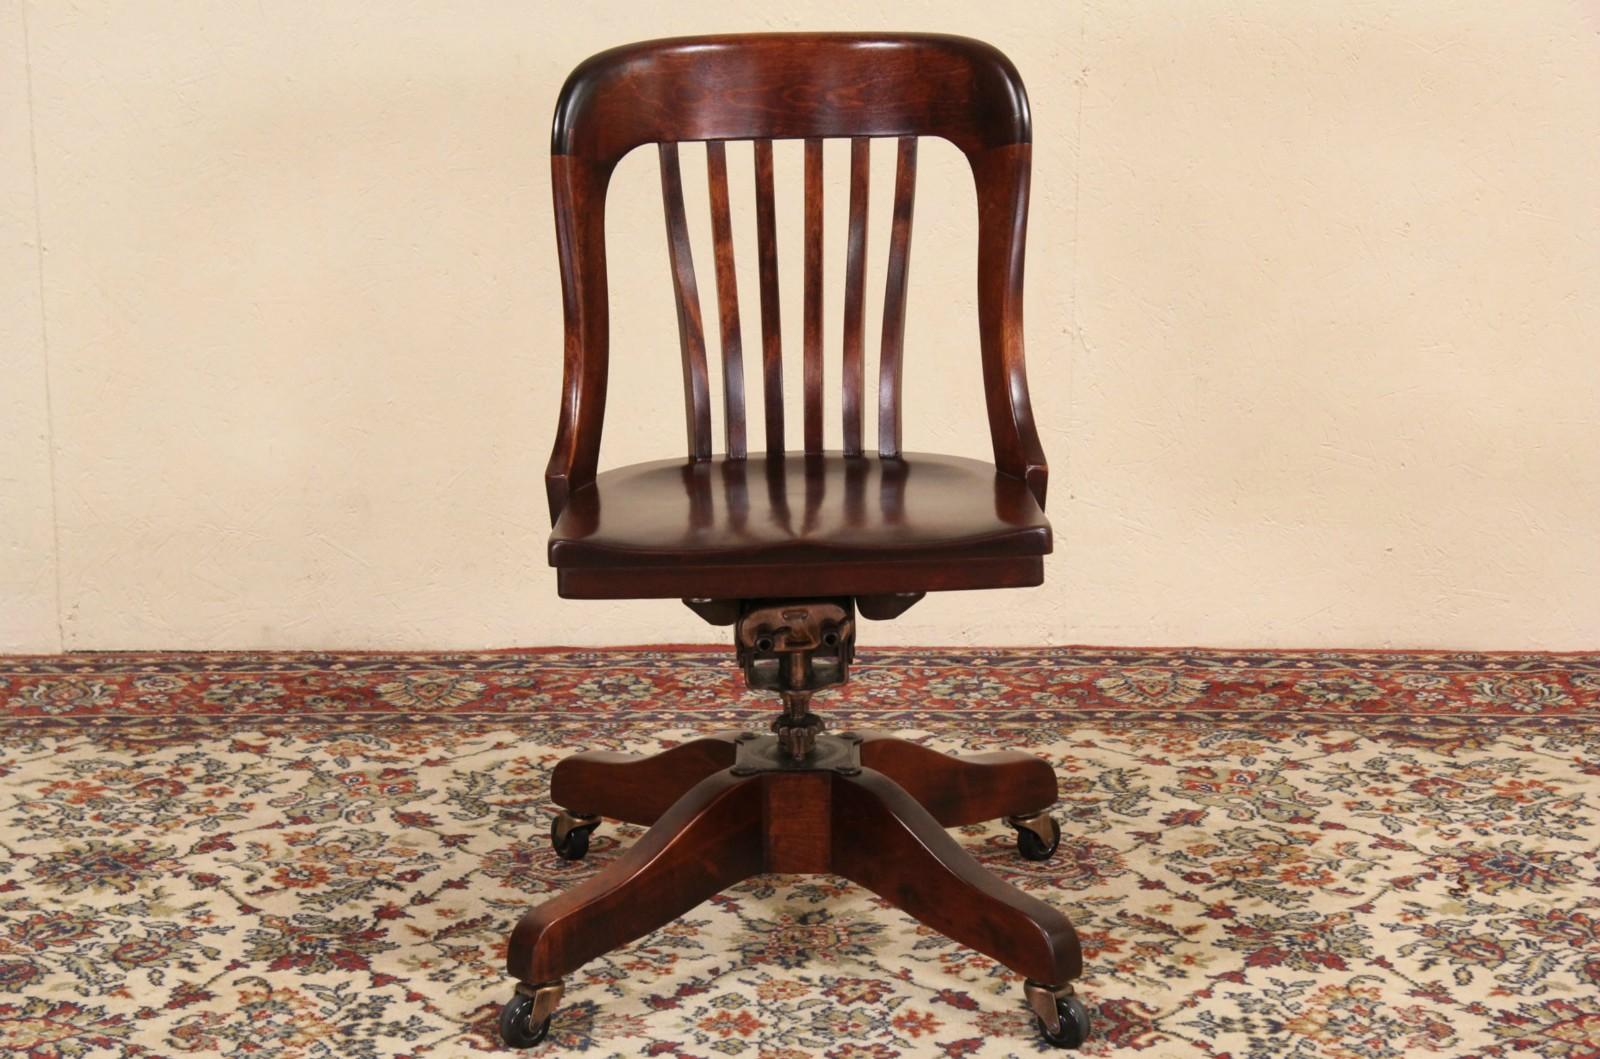 Marble Shattuck Signed Swivel Adjule Antique 1915 Desk Chair